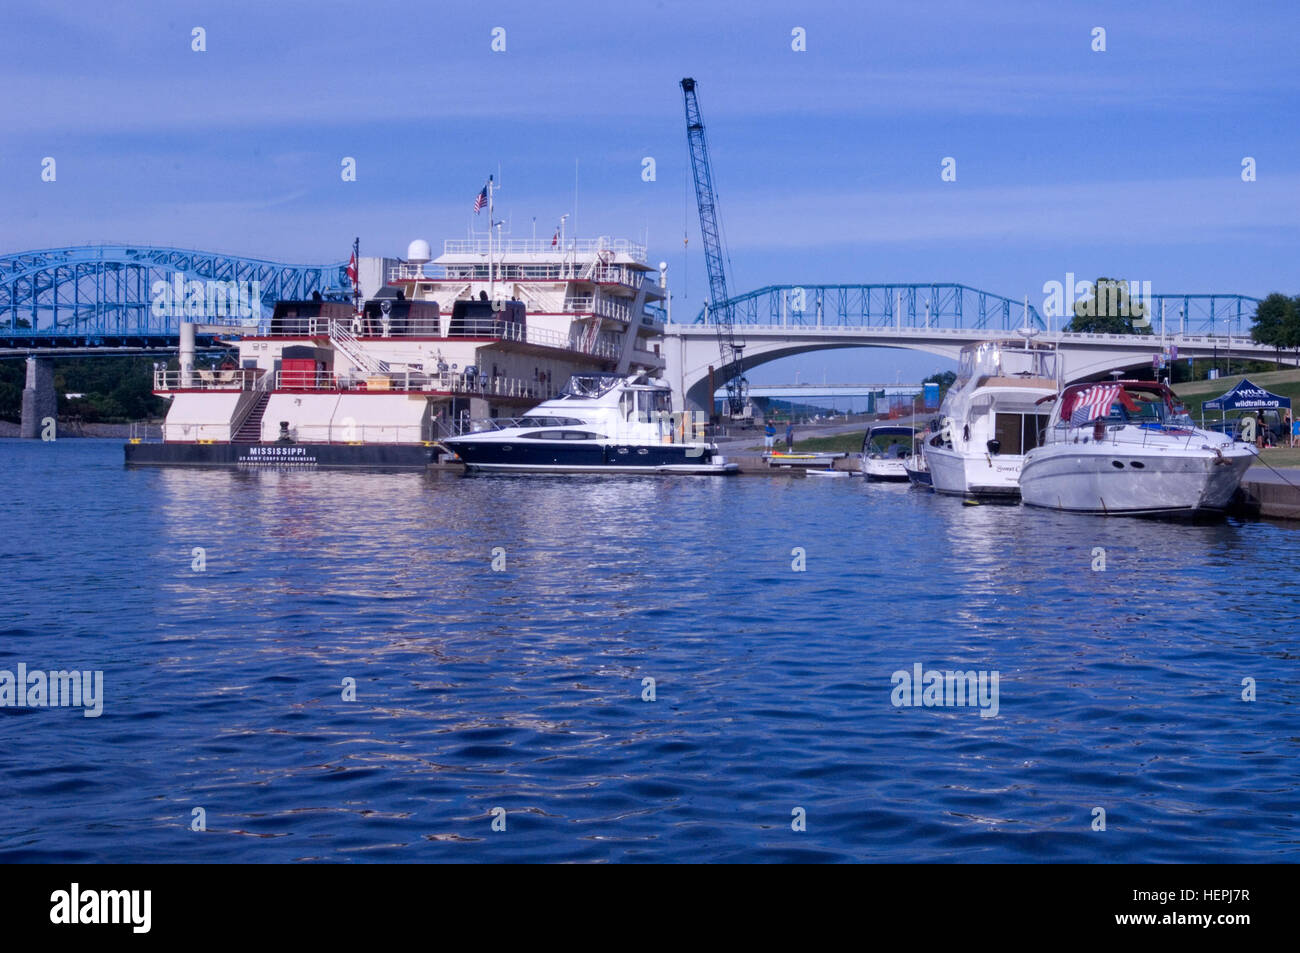 The Motor Vessel Mississippi is docked at Ross's Landing in Chattanooga, Tenn., Aug. 8, 2015. The M/V Mississippi Stock Photo